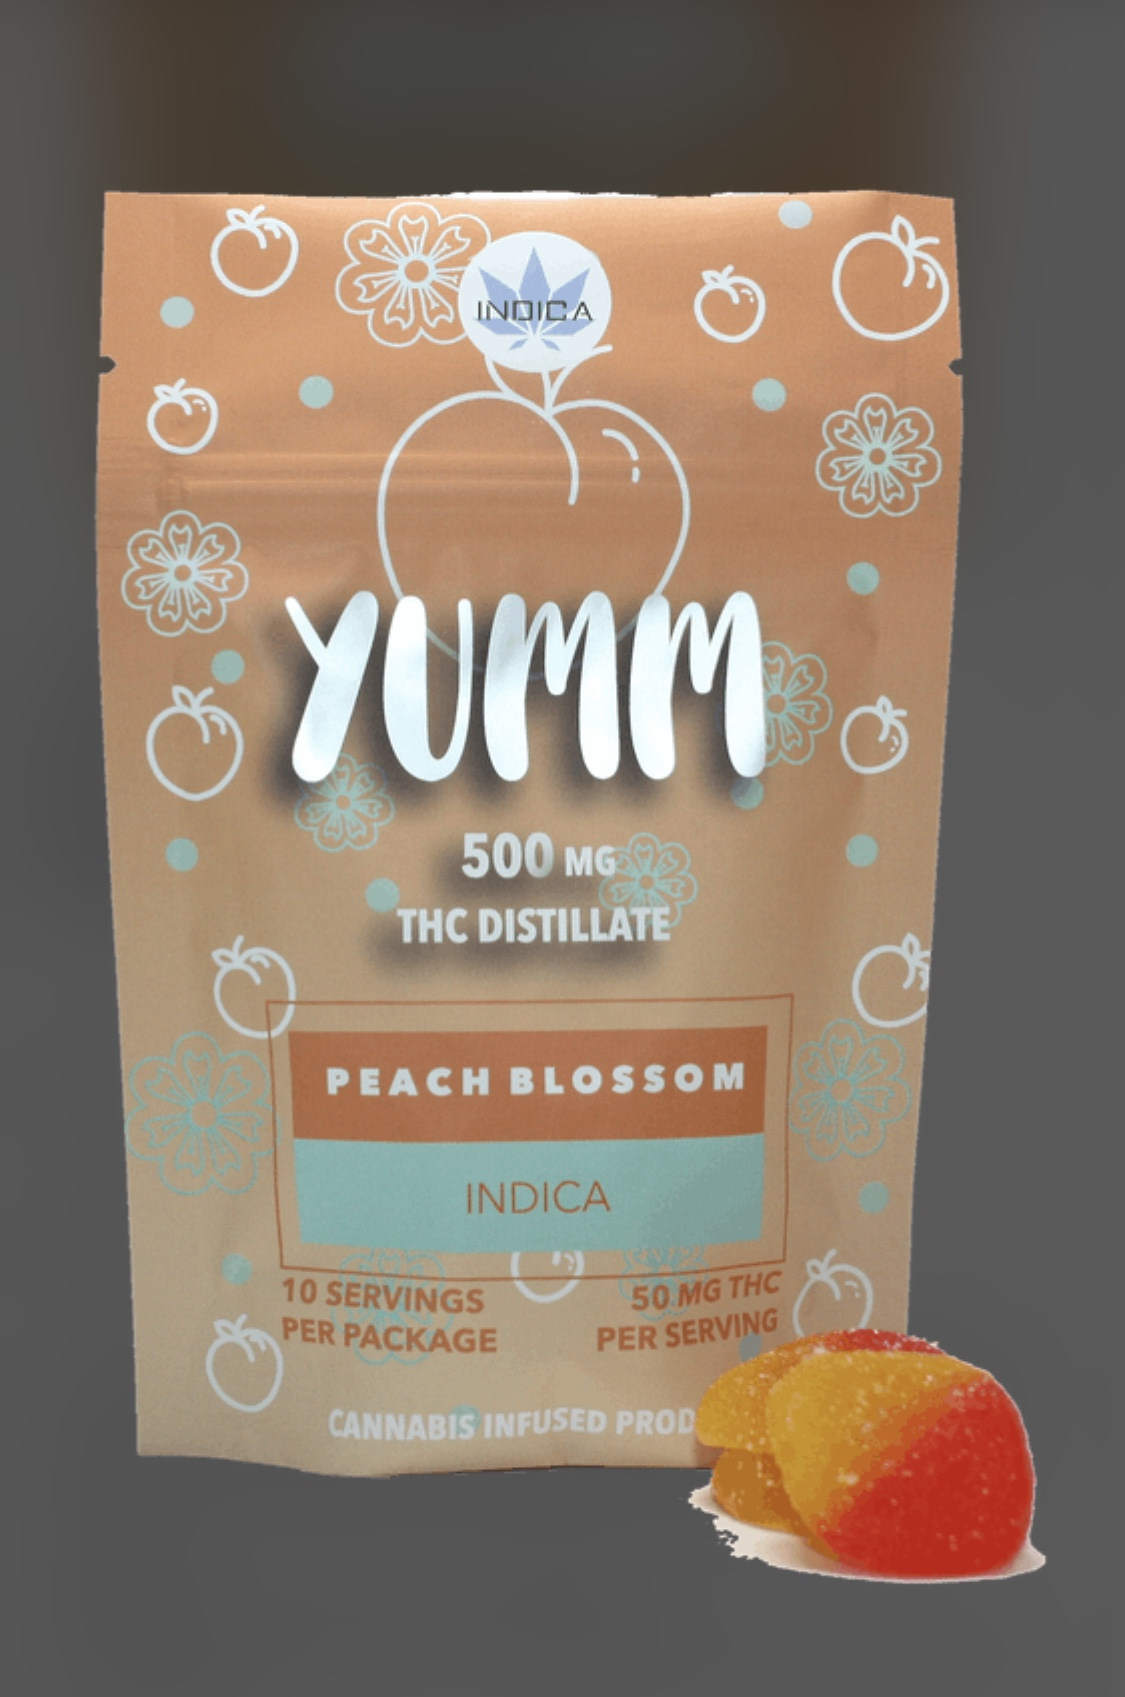 *New* Yumm-Peach Blossom 500mg Sativa or Indica